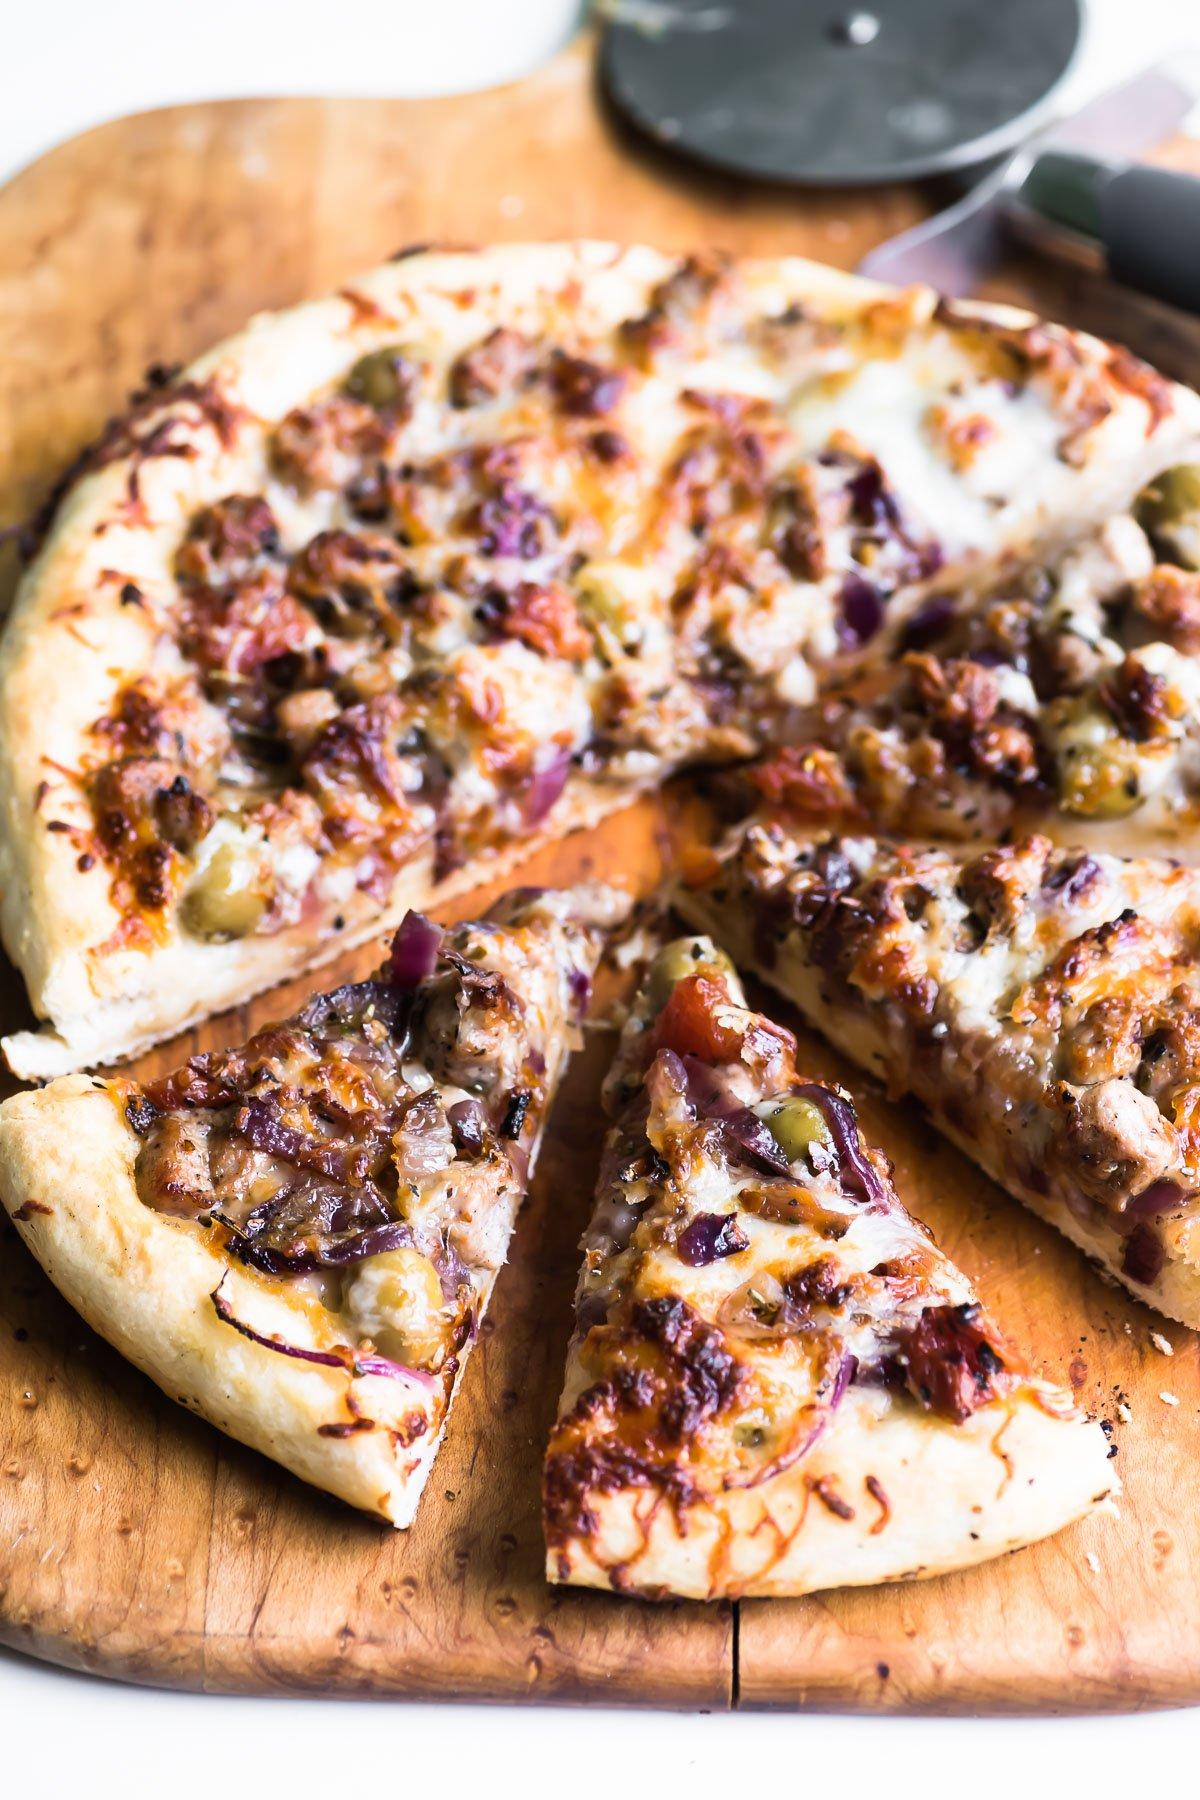 Jamie Oliver's No Yeast Pizza, sliced